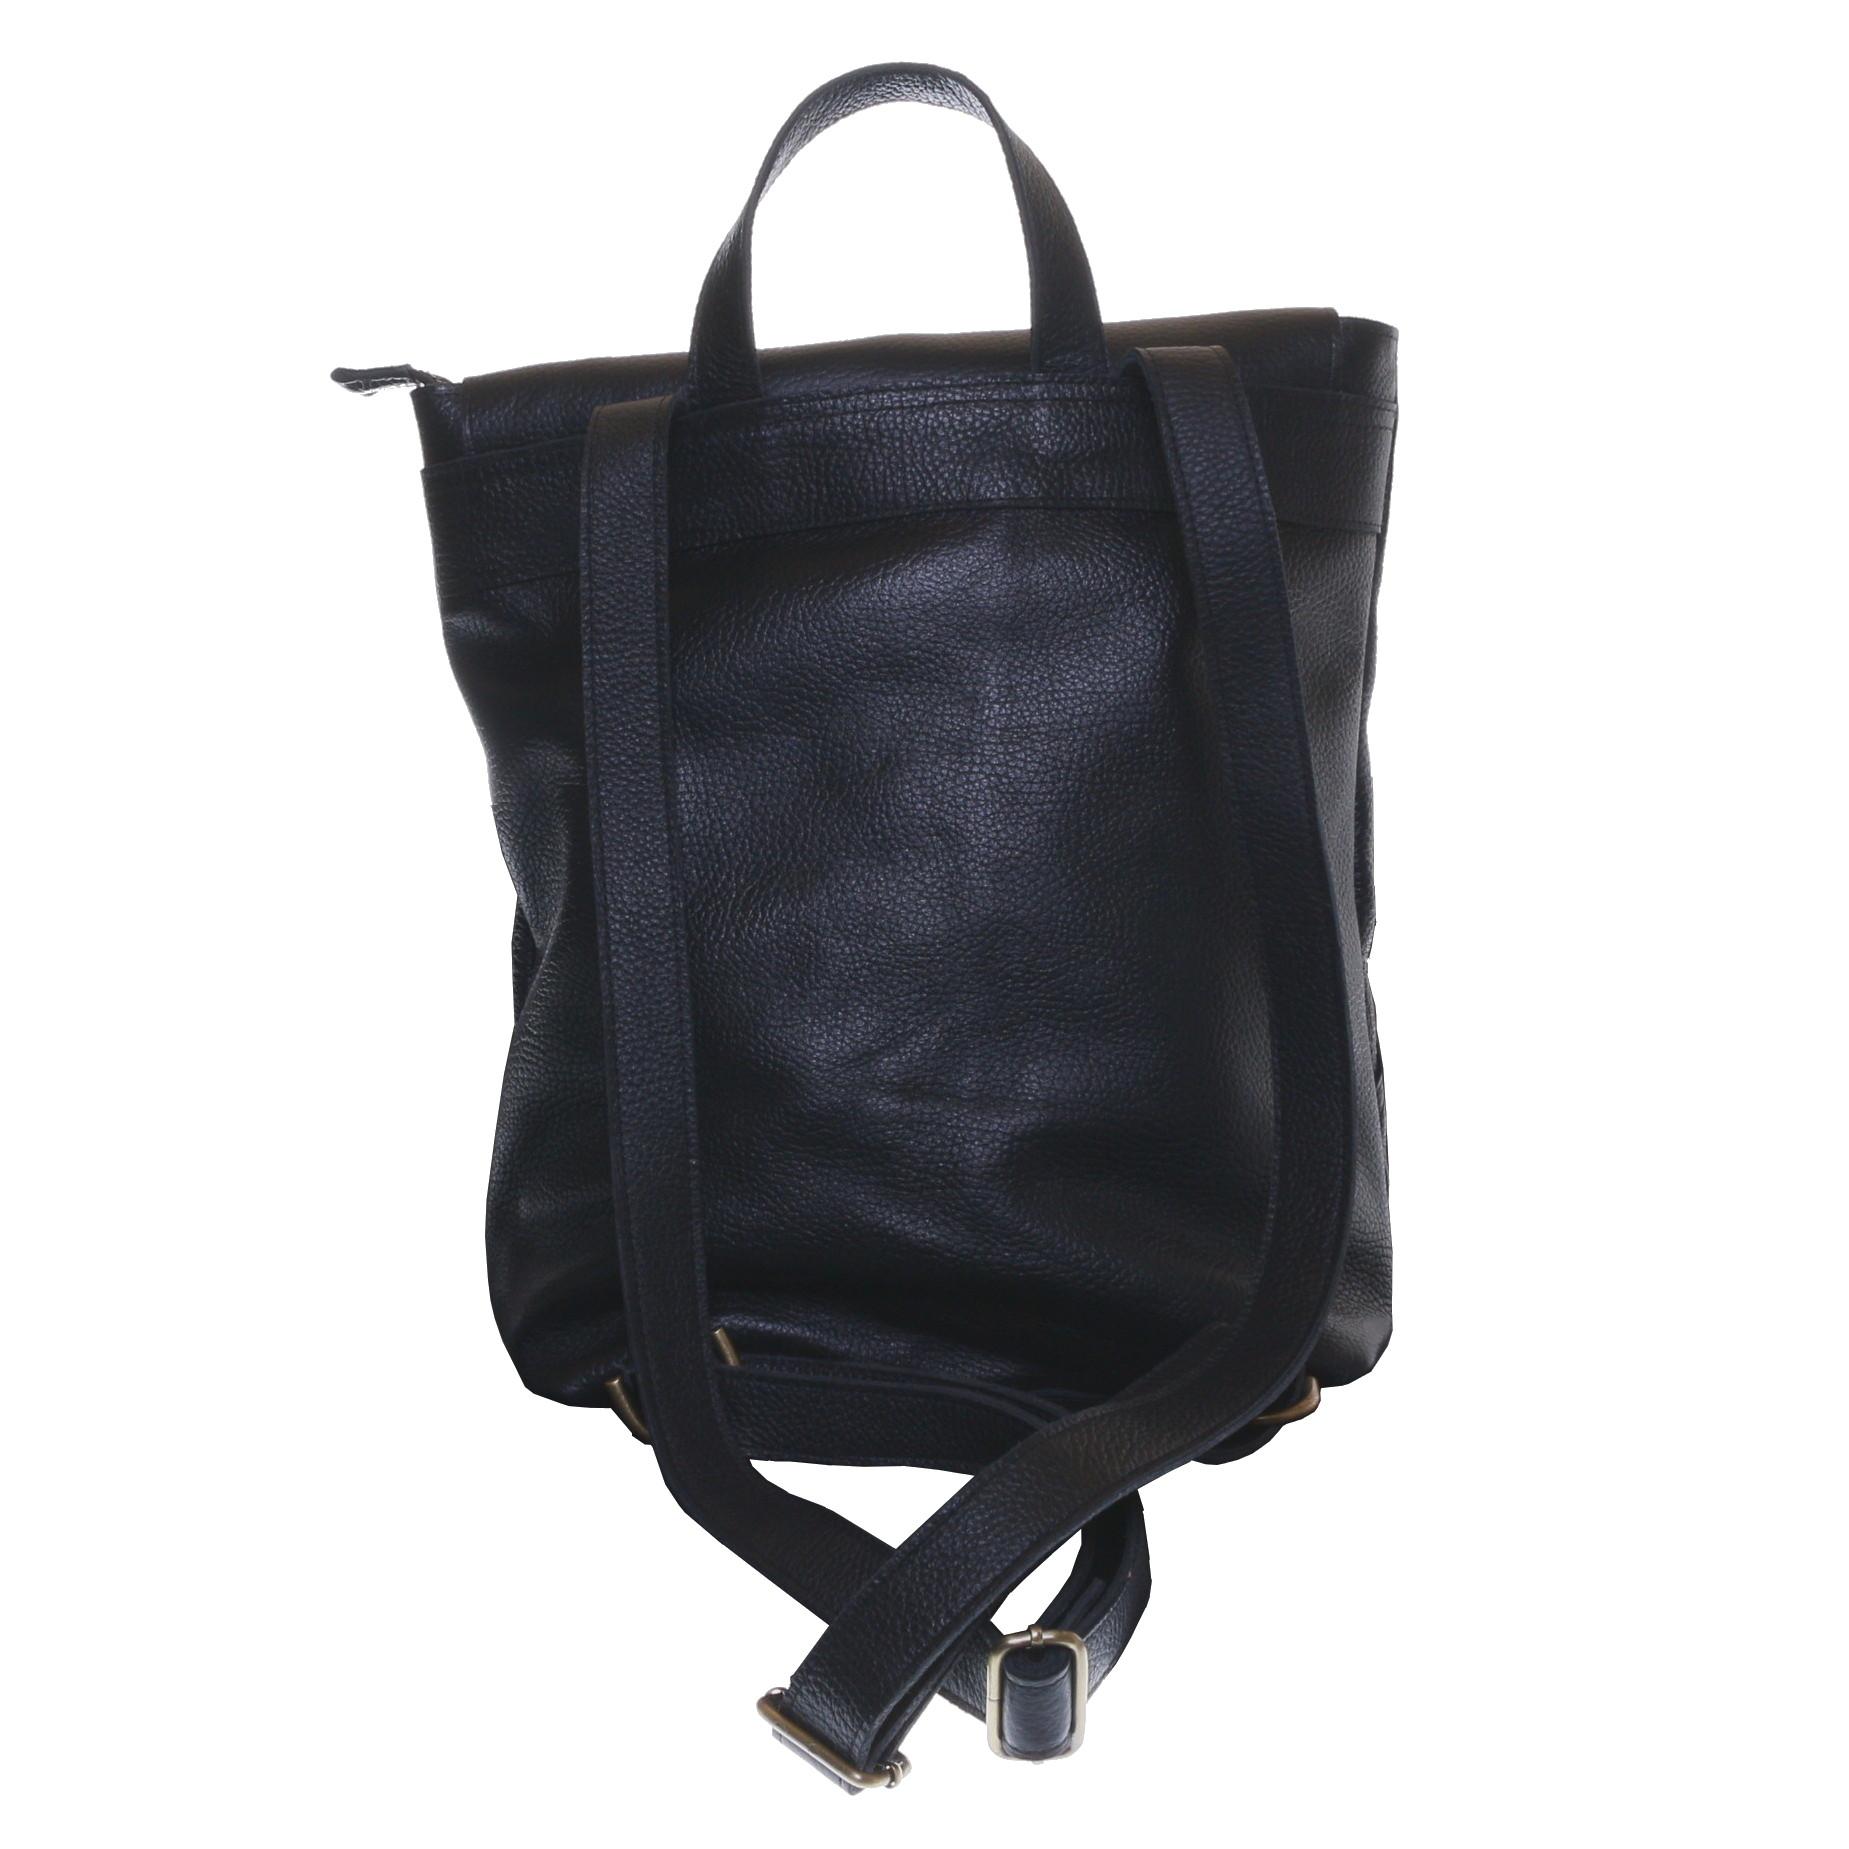 Gundara - laptop backpack - genuine cow leather from Ethiopia - handmade